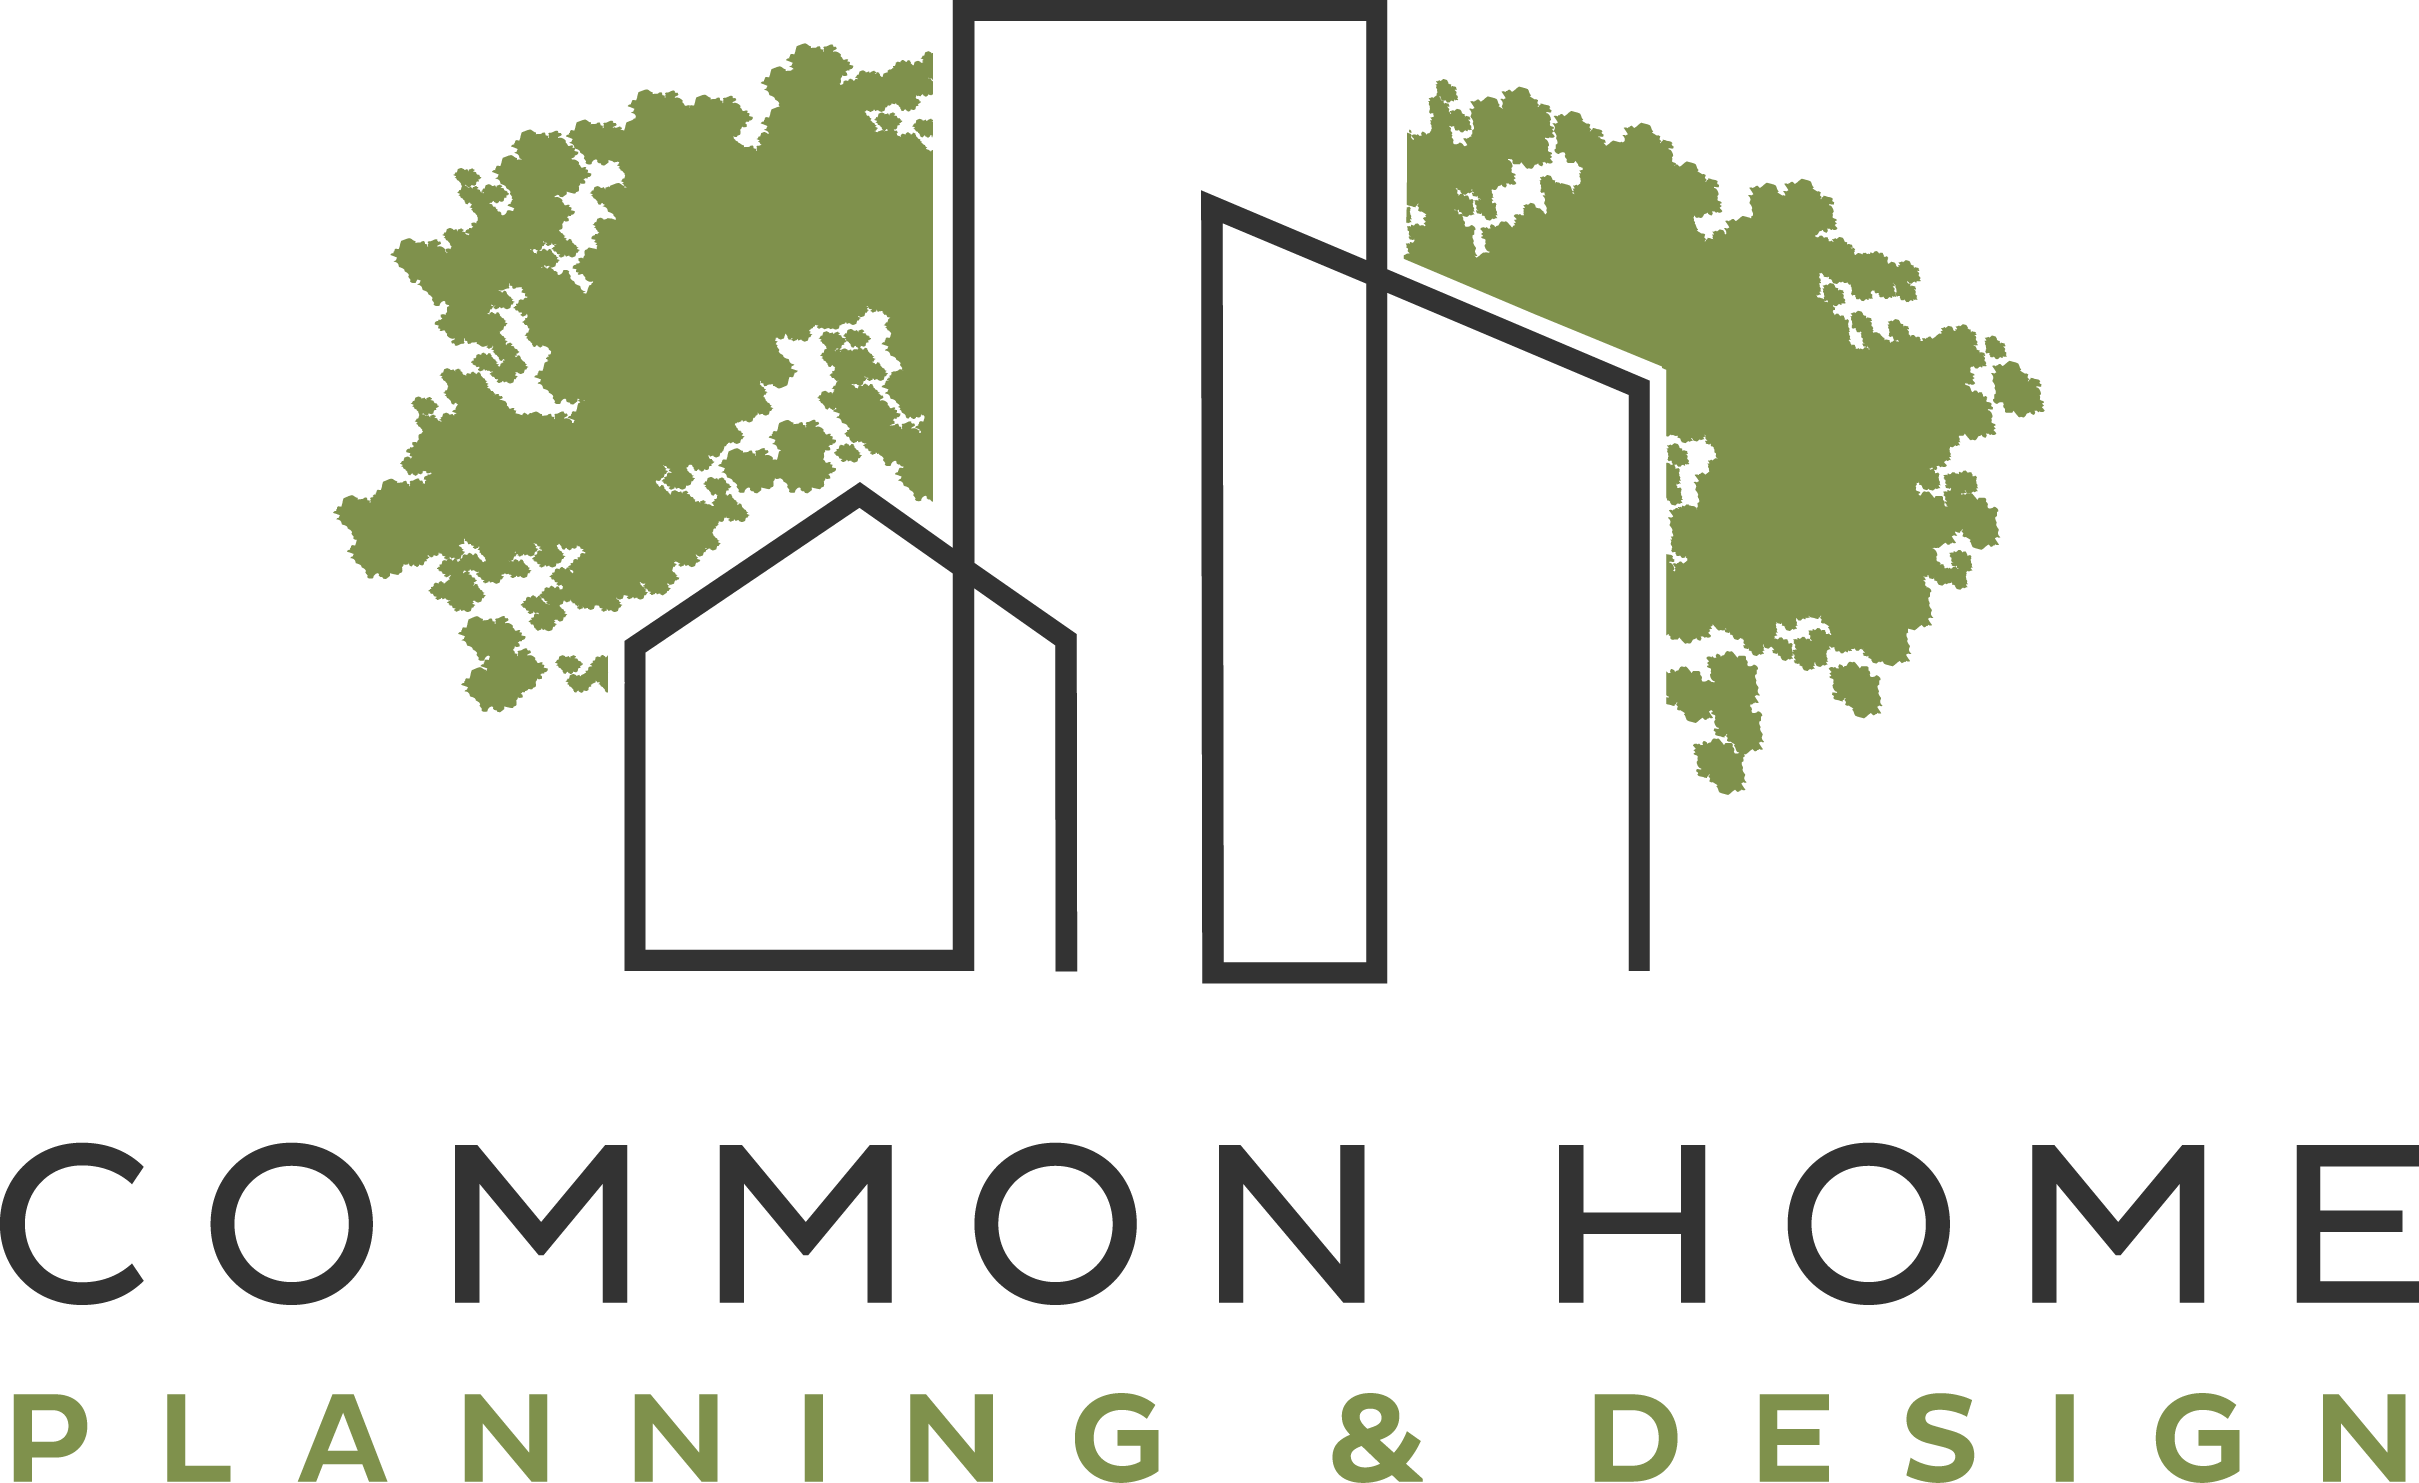 Common Home Planning & Design